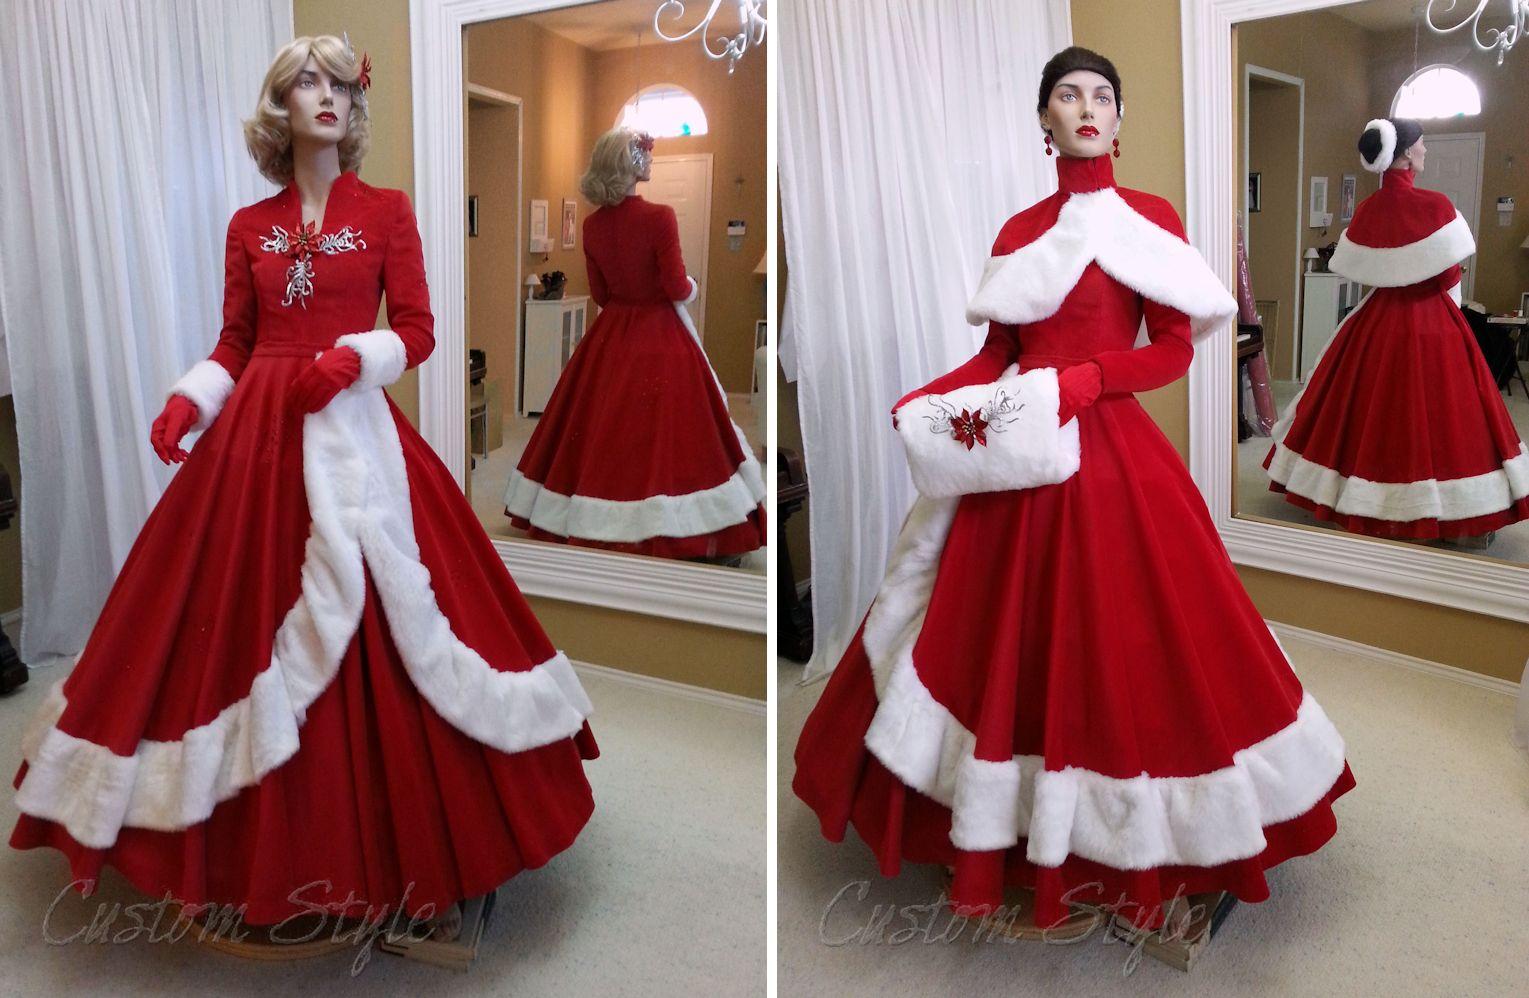 1950s Christmas Dresses – Fashion design images